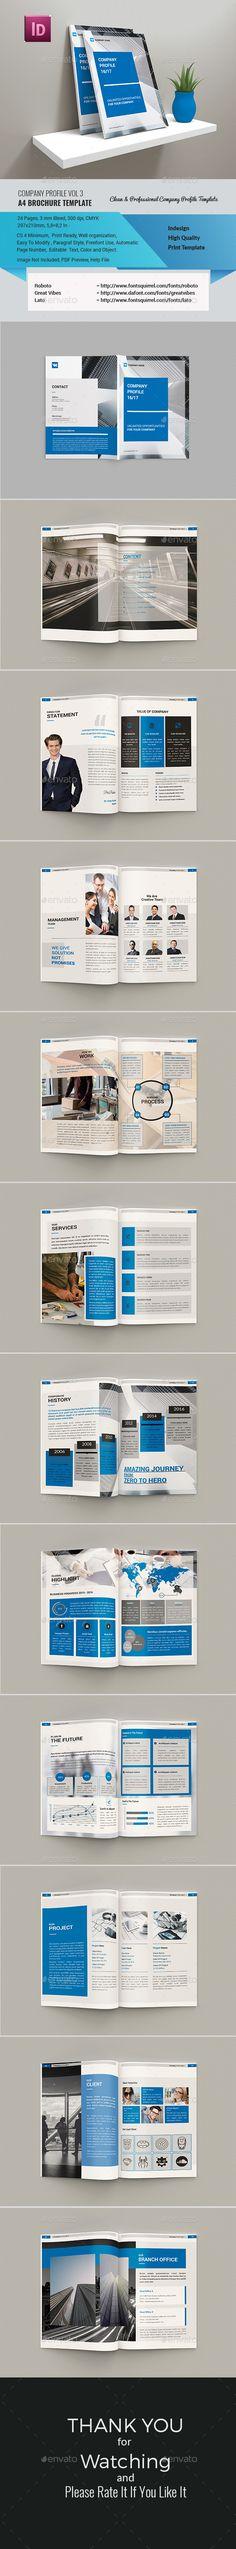 Company Profile Vol 3 - #Corporate #Brochures Download here: https://graphicriver.net/item/company-profile-vol-3/19214182?ref=alena994